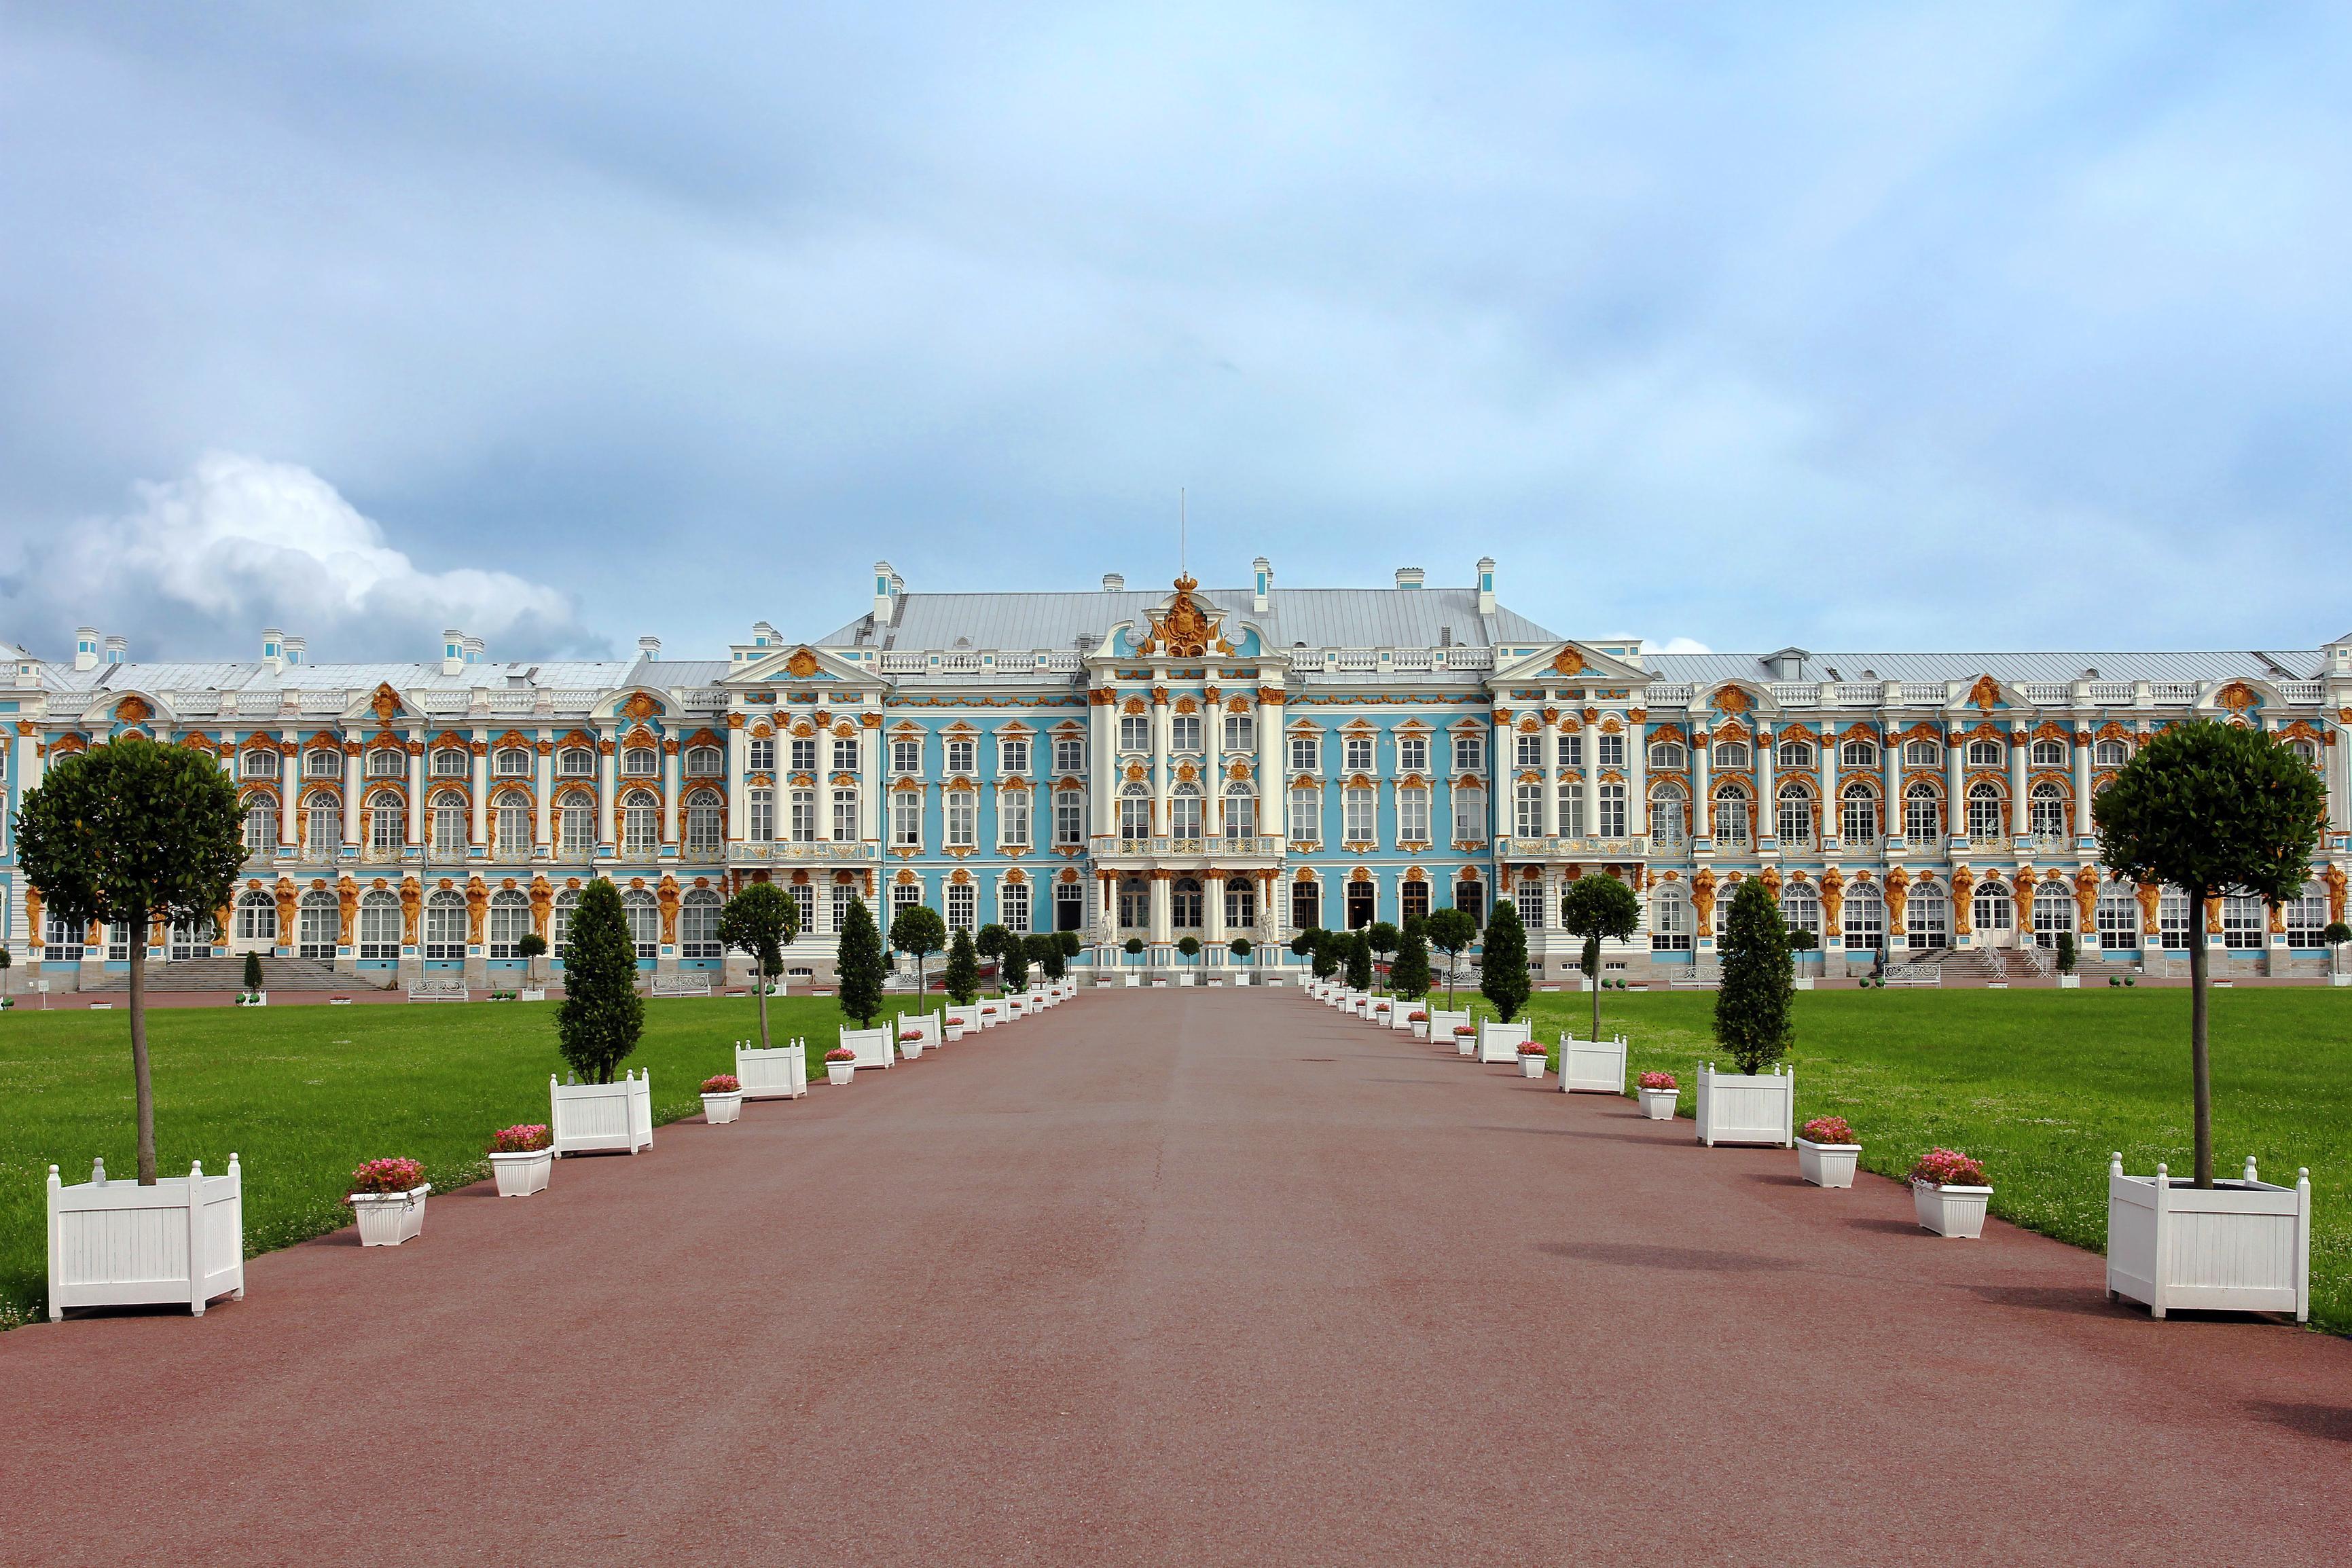 Dreamstime © - Saint-Pétersbourg - Tsarskoe Selo - Ensemble